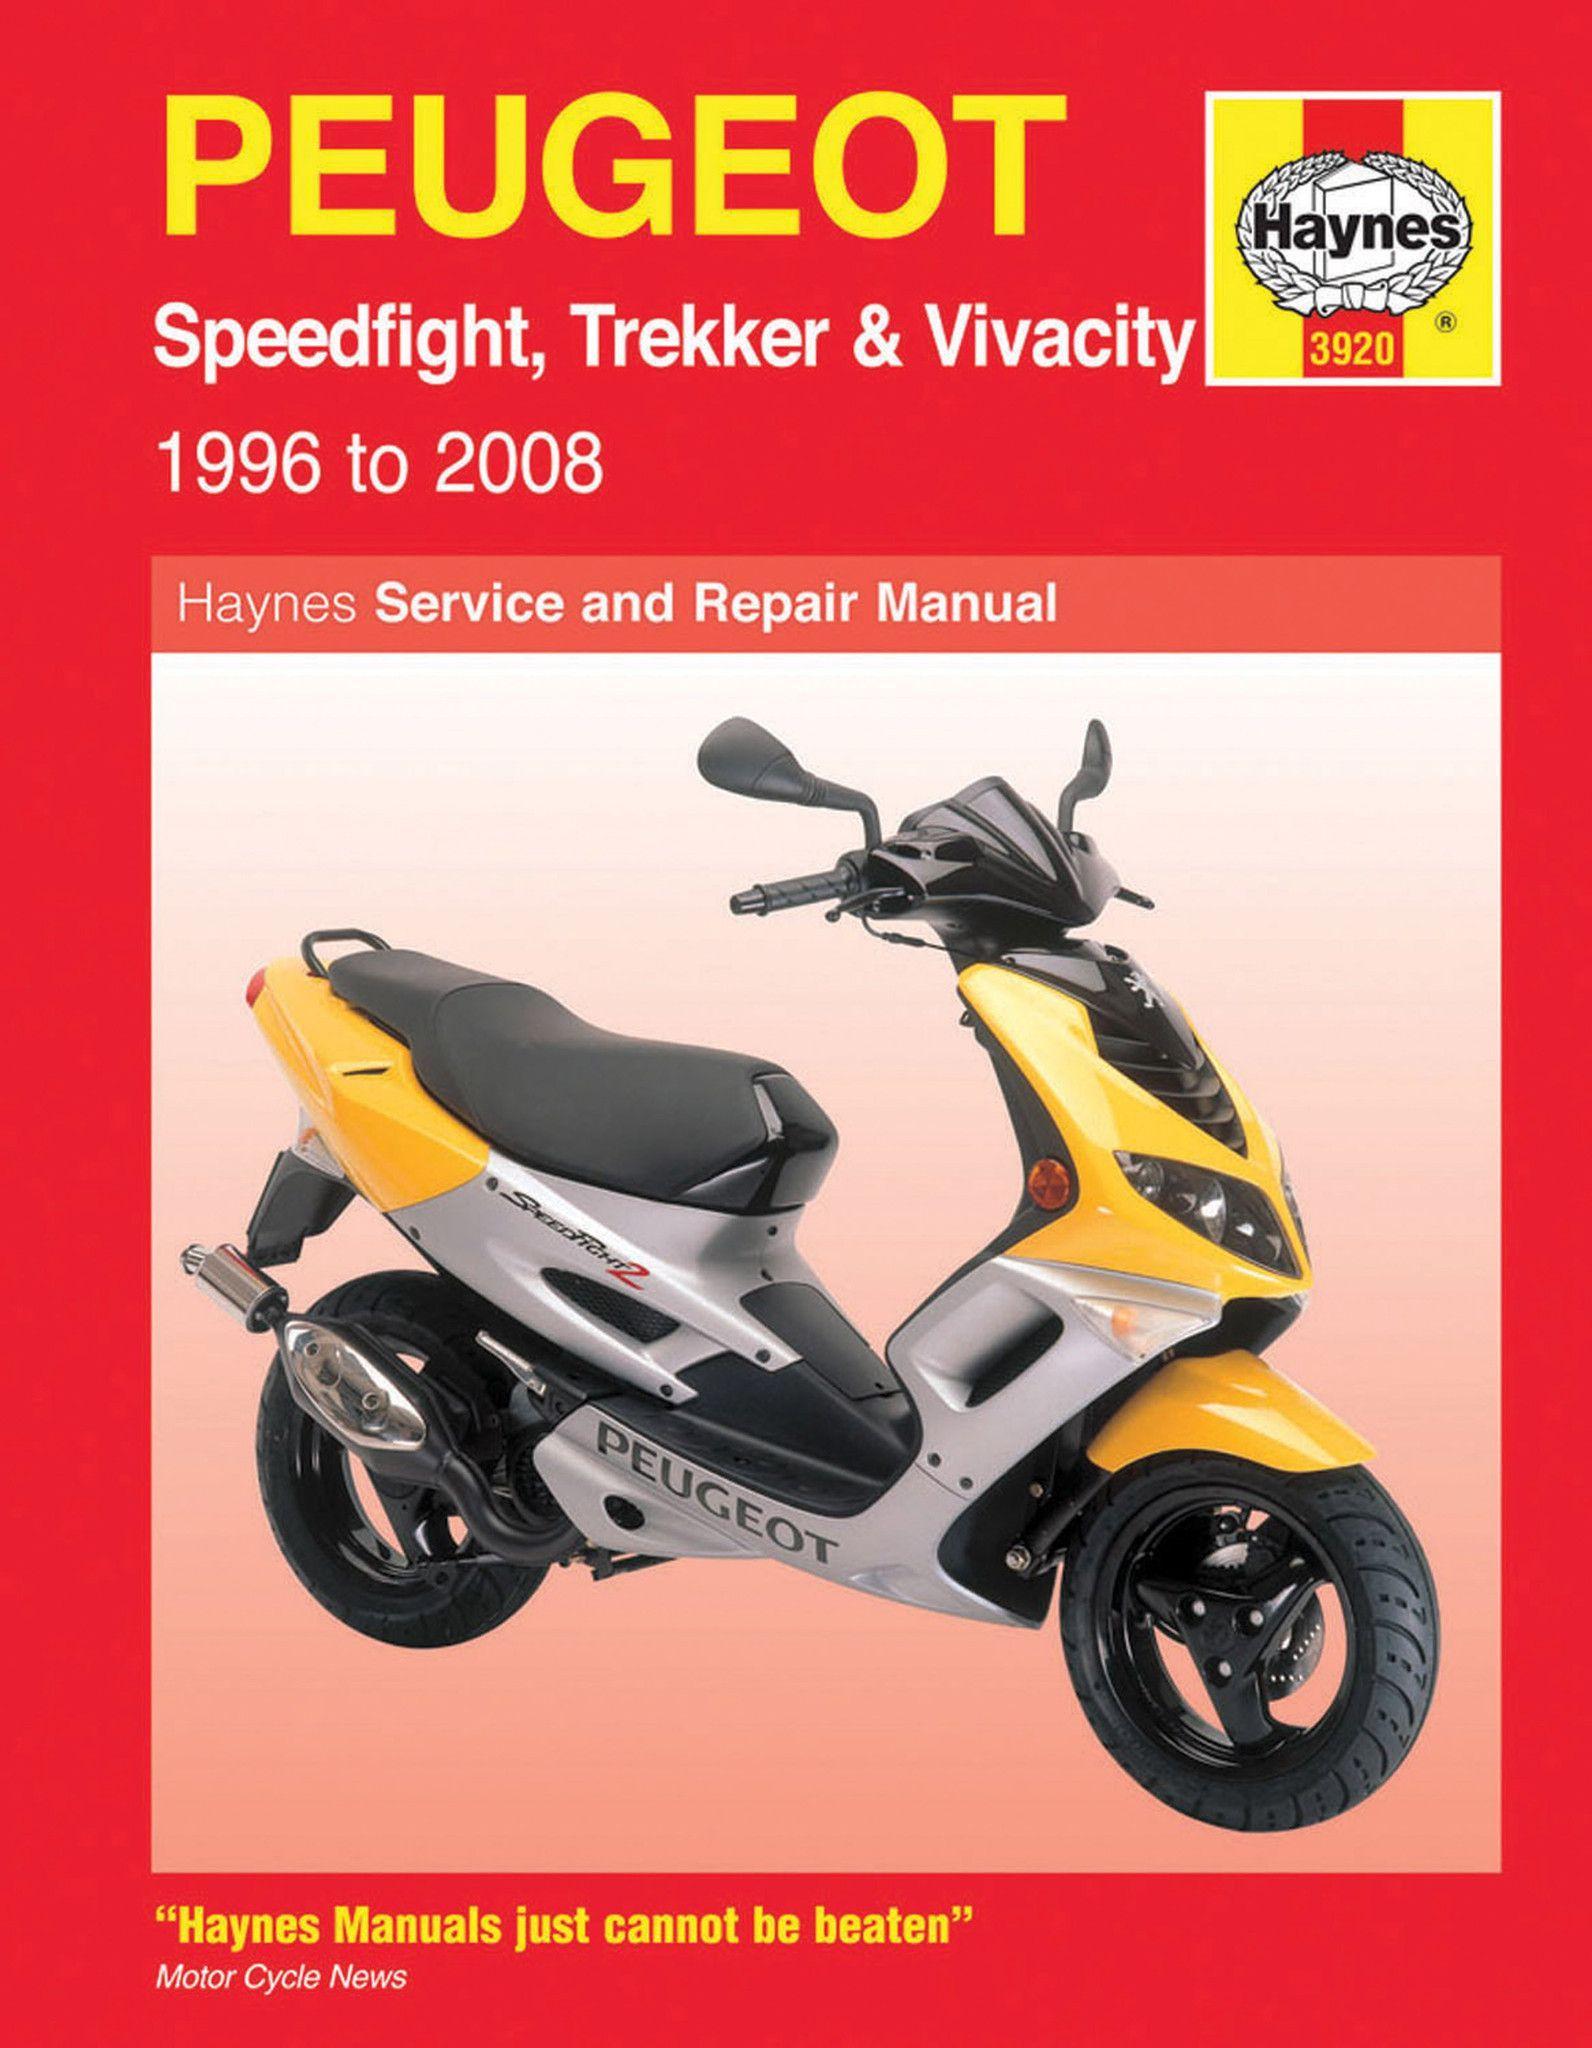 Haynes M3920 Repair Manual for 1996-08 Peugeot Speedfight / Trekker /  Vivacity